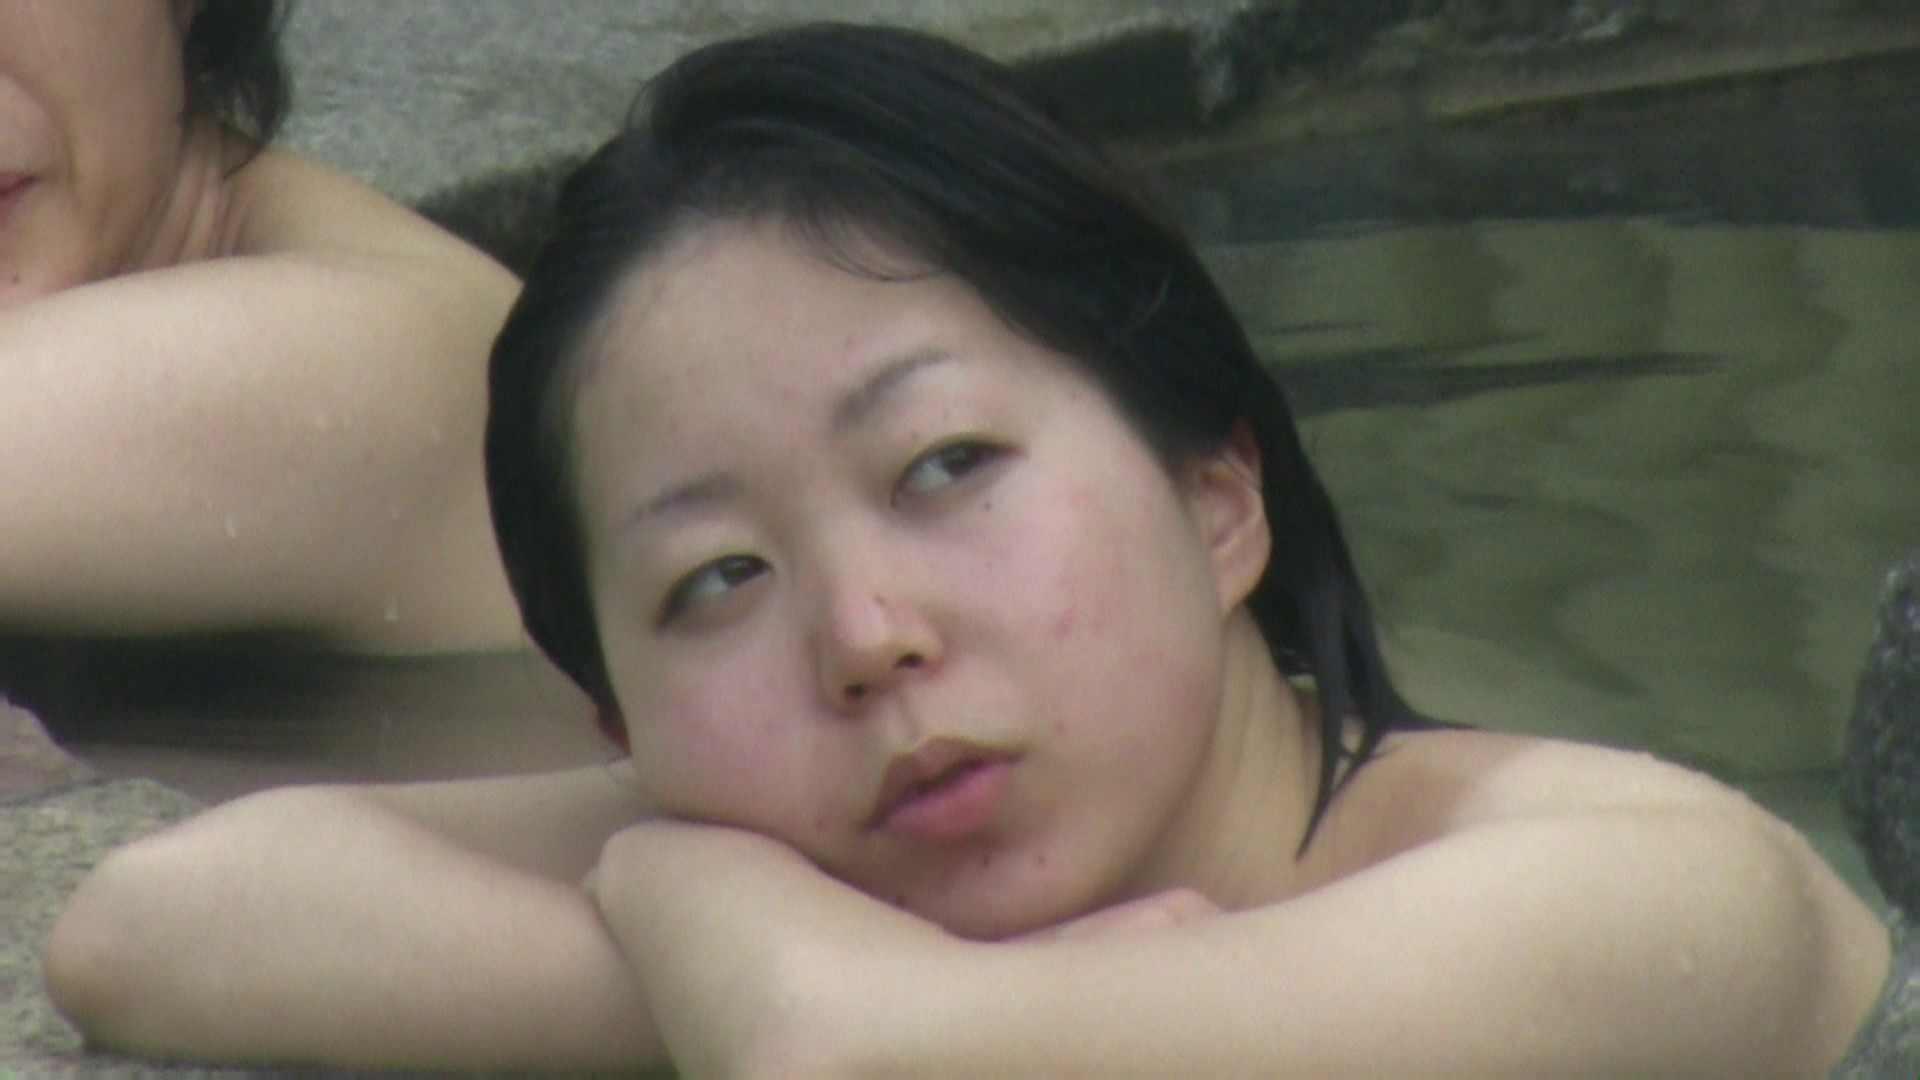 Aquaな露天風呂Vol.06【VIP】 HなOL | 盗撮  86pic 21